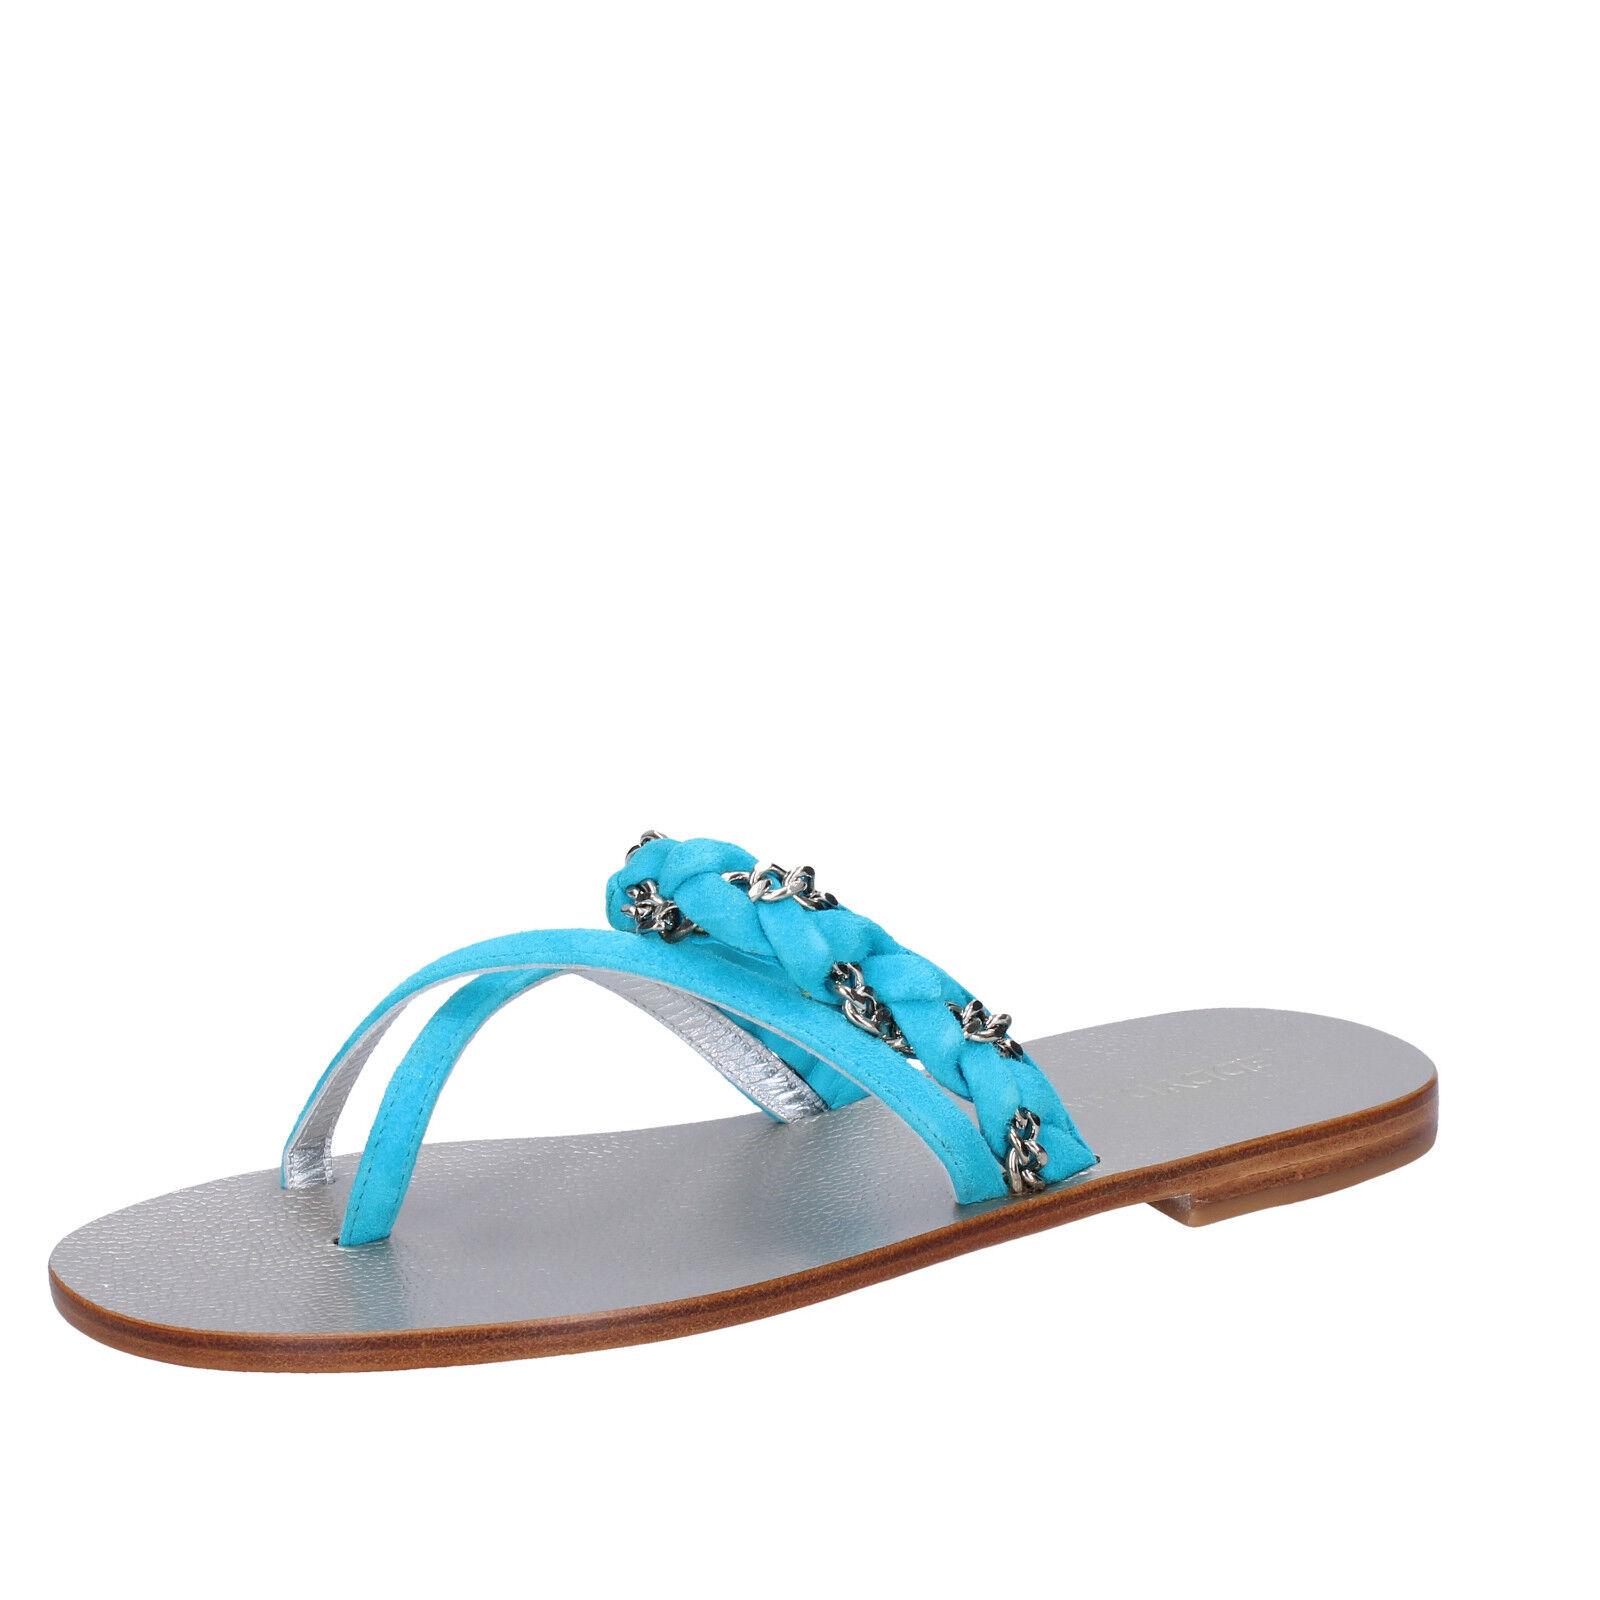 scarpe EU donna EDDY DANIELE 37 EU scarpe sandali celeste camoscio AW193-37 ac5f2c